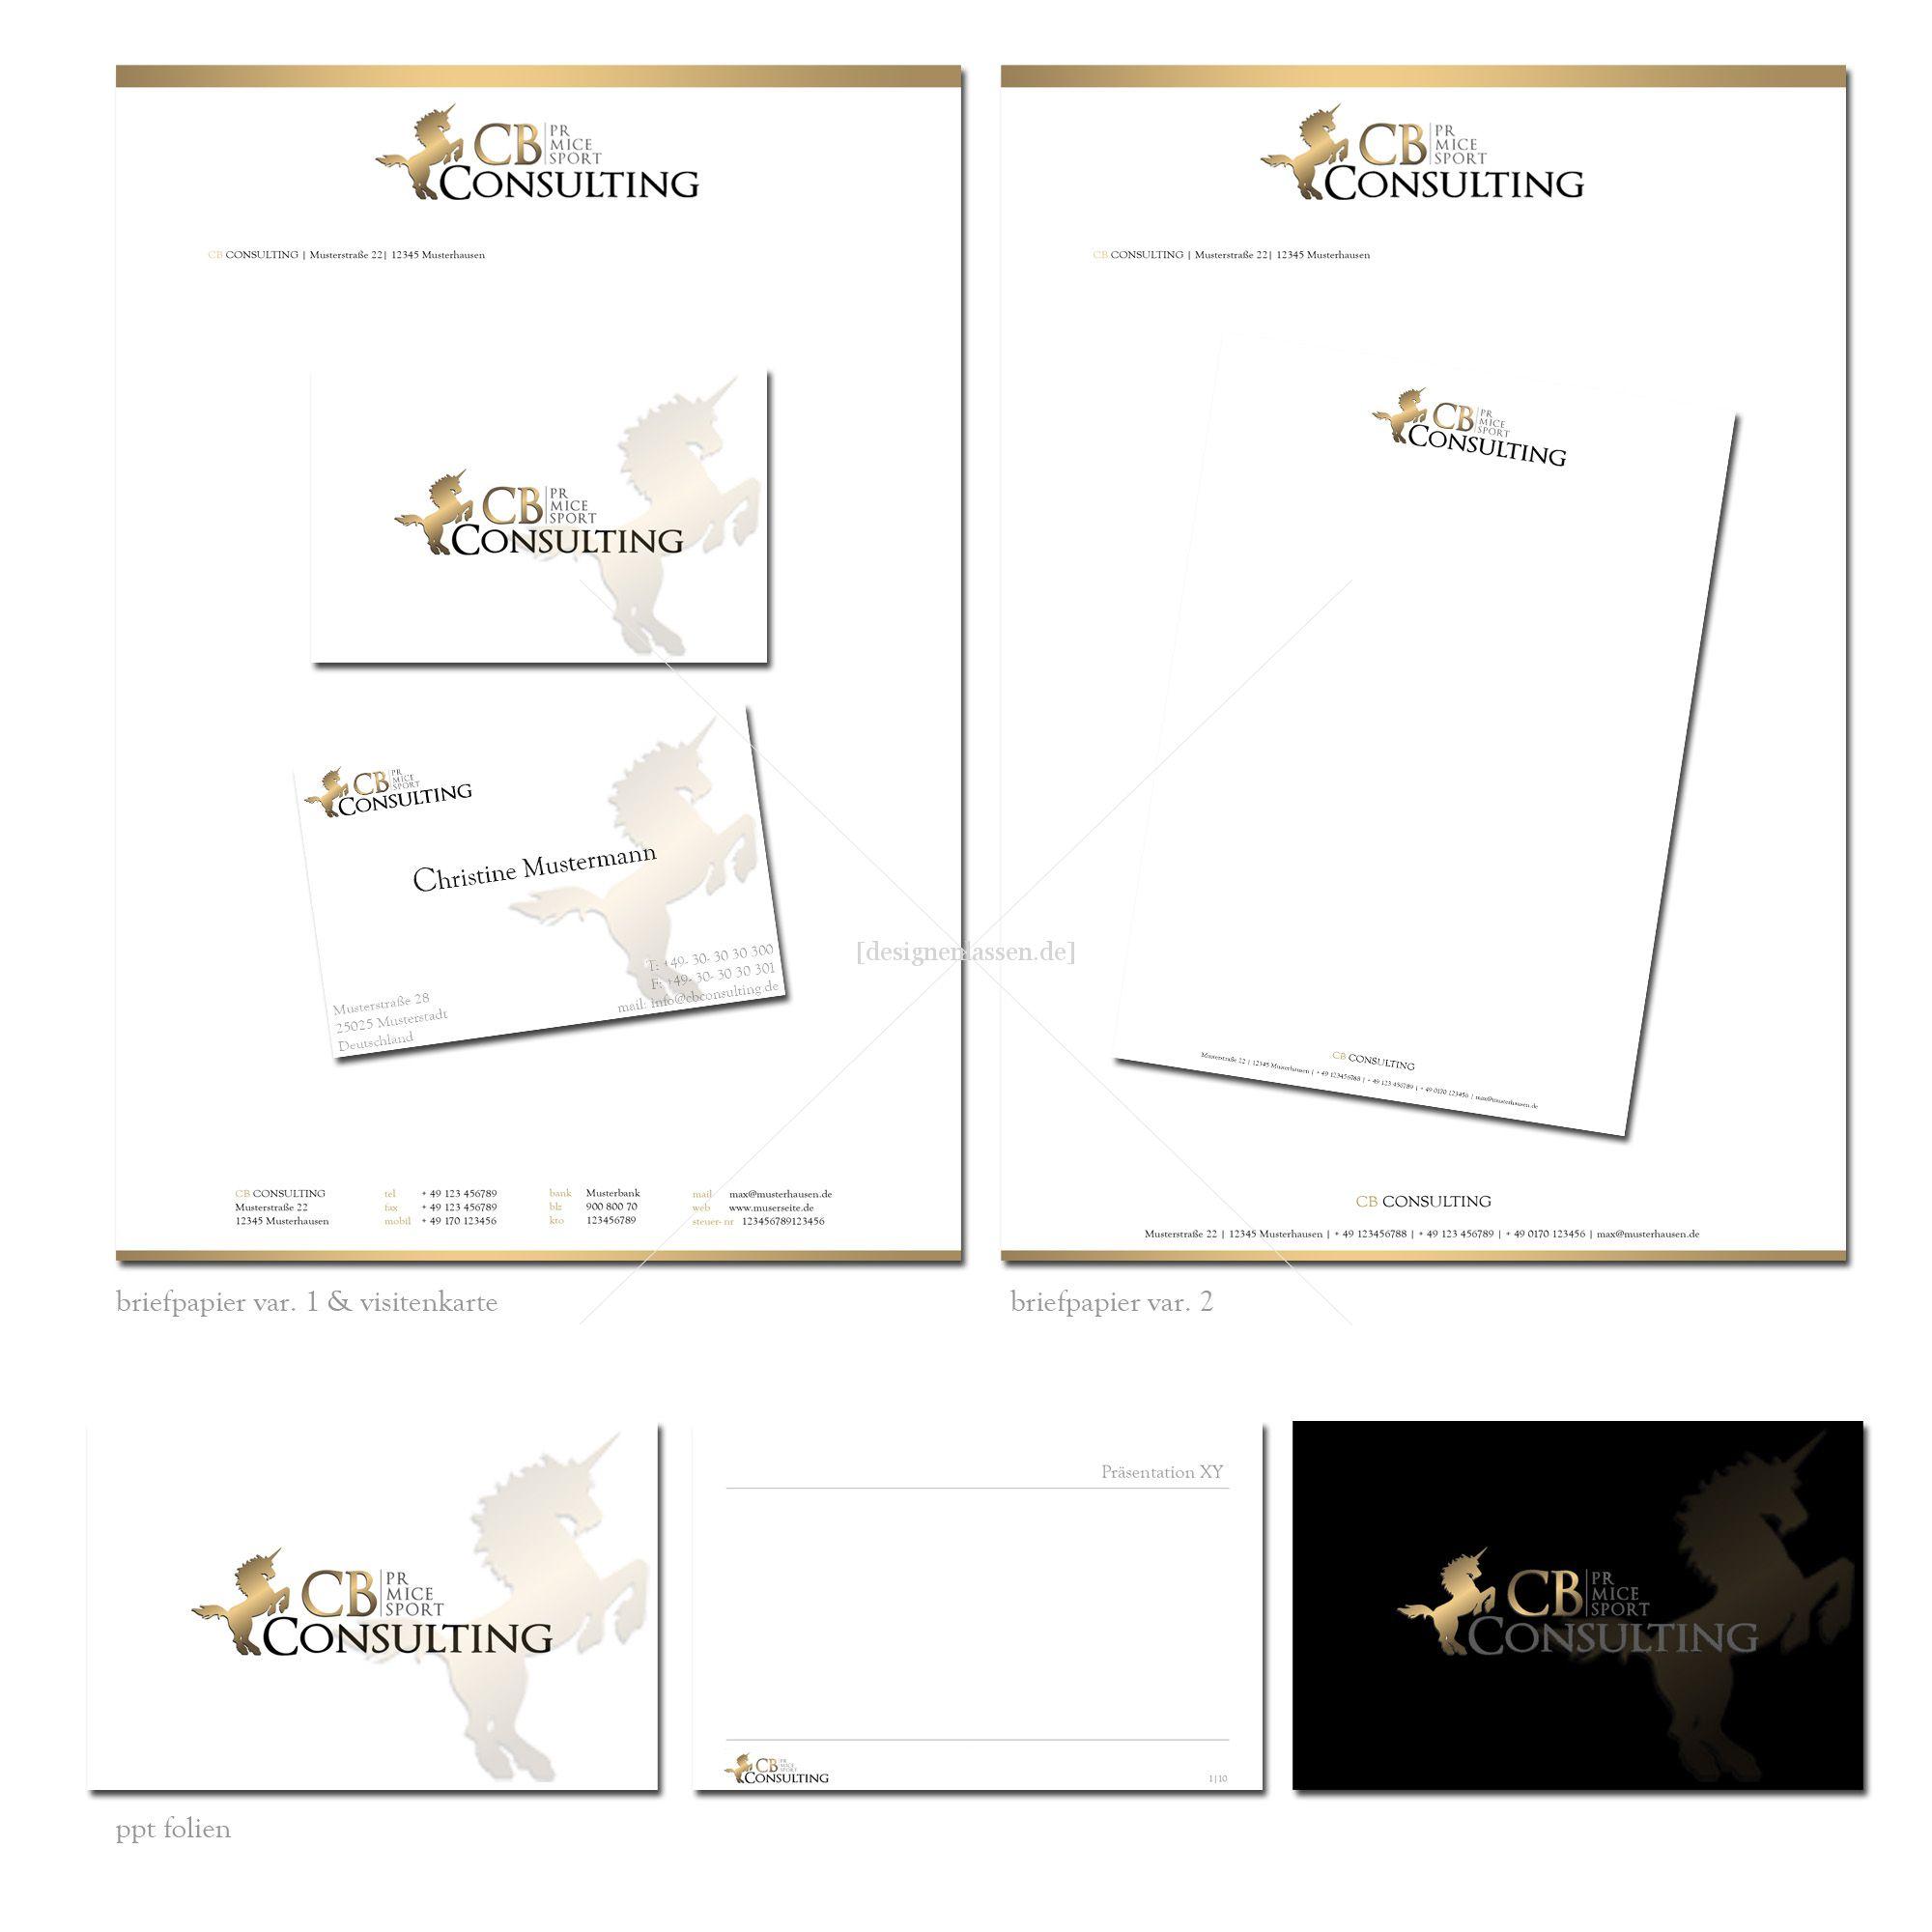 Briefpapier Business Cards Power Point Folie